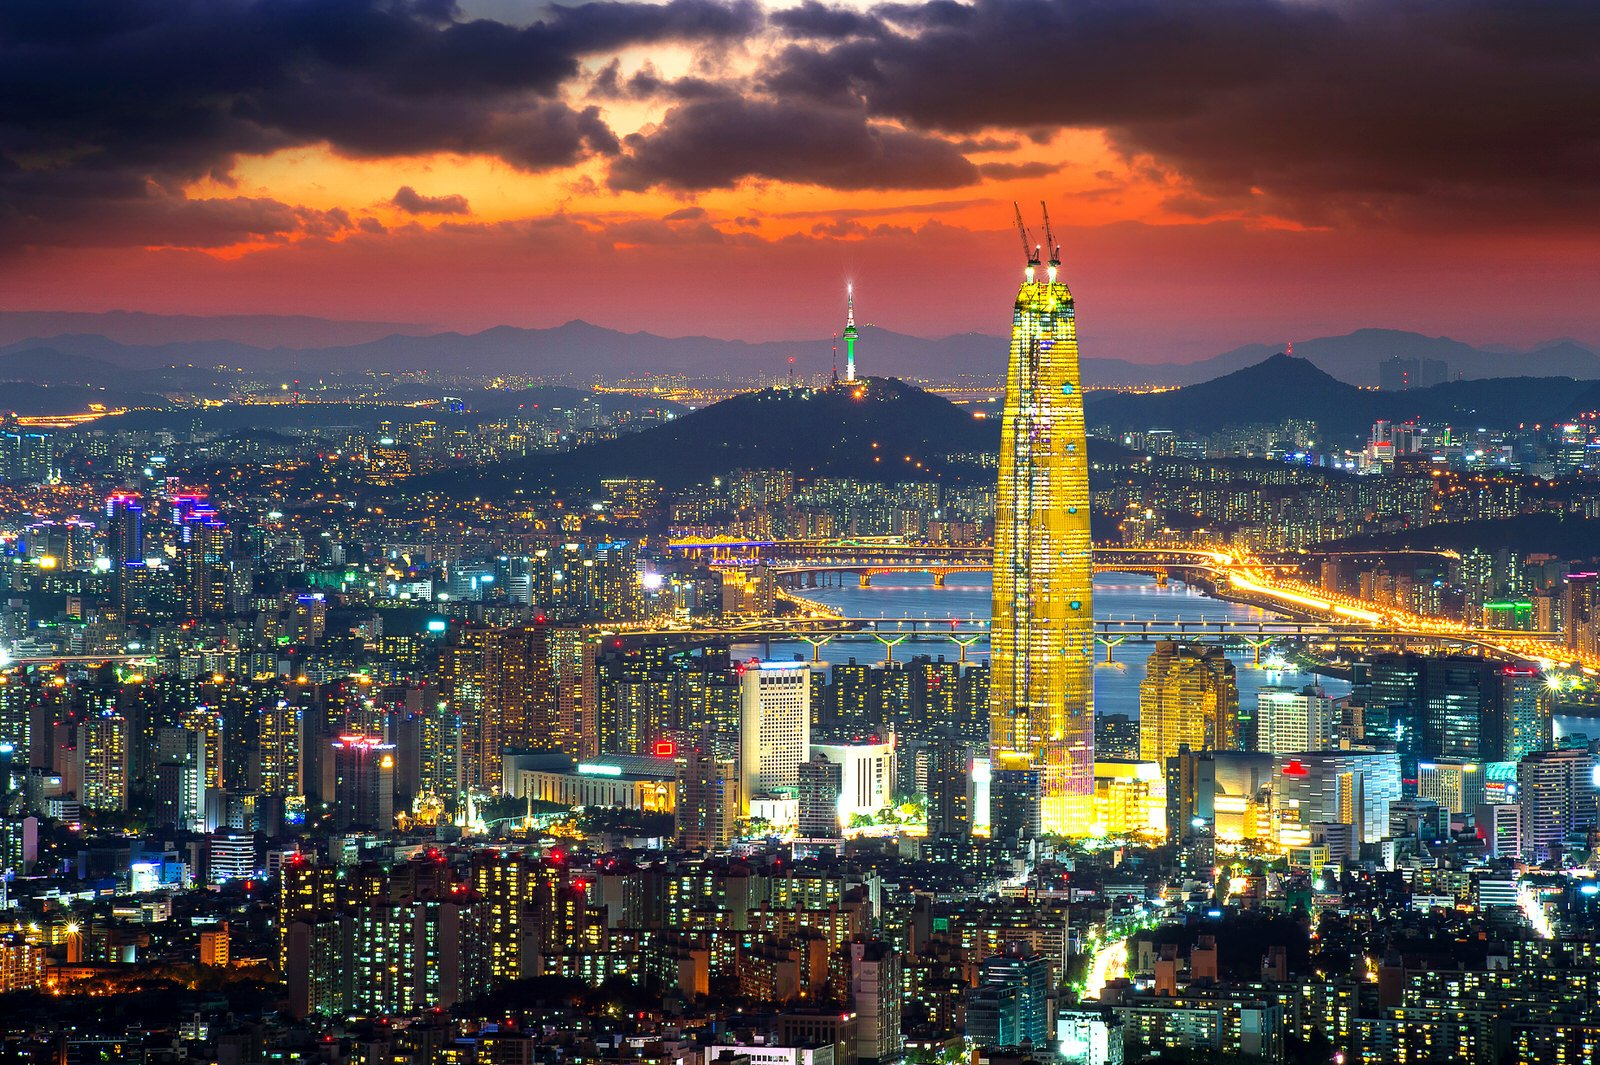 Южная корея картинки красивые, картинке